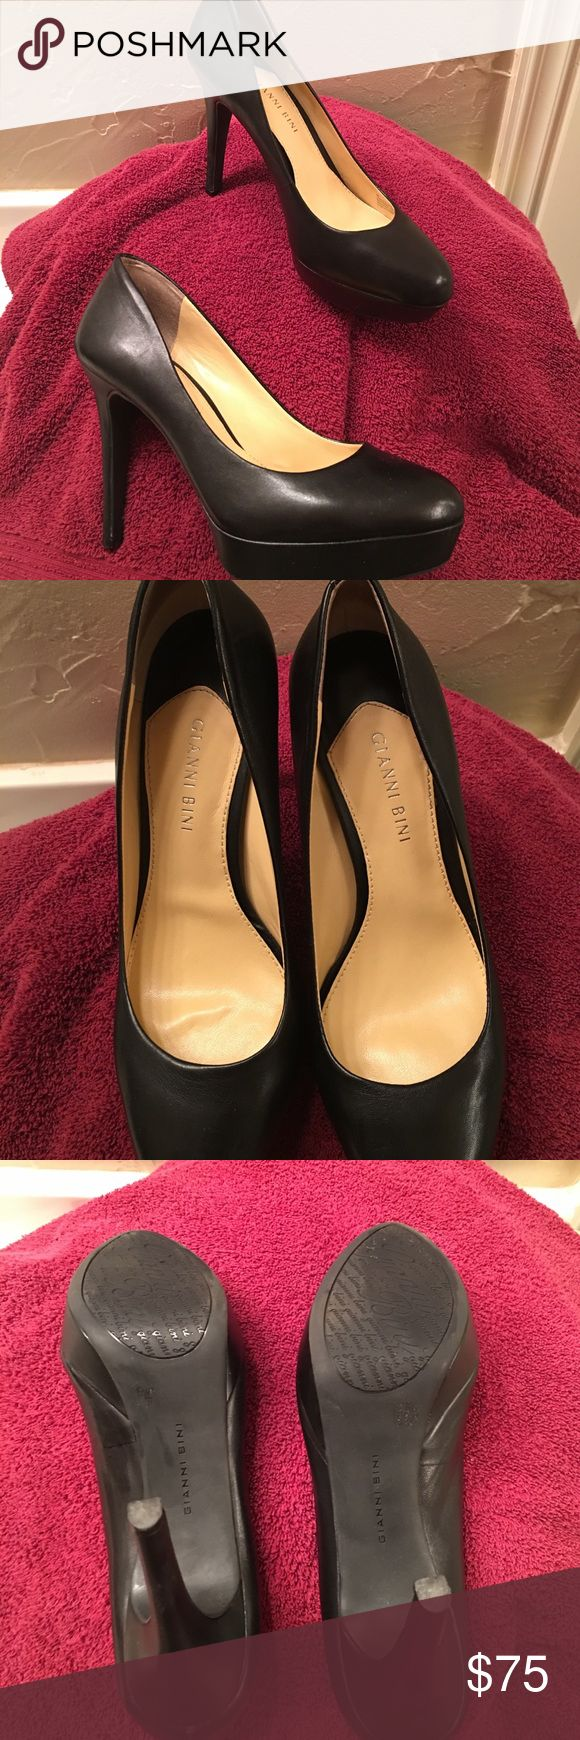 Gianni Bini platform shoes Black platform shoes by Gianni Bini. Sophisticated. Gianni Bini Shoes